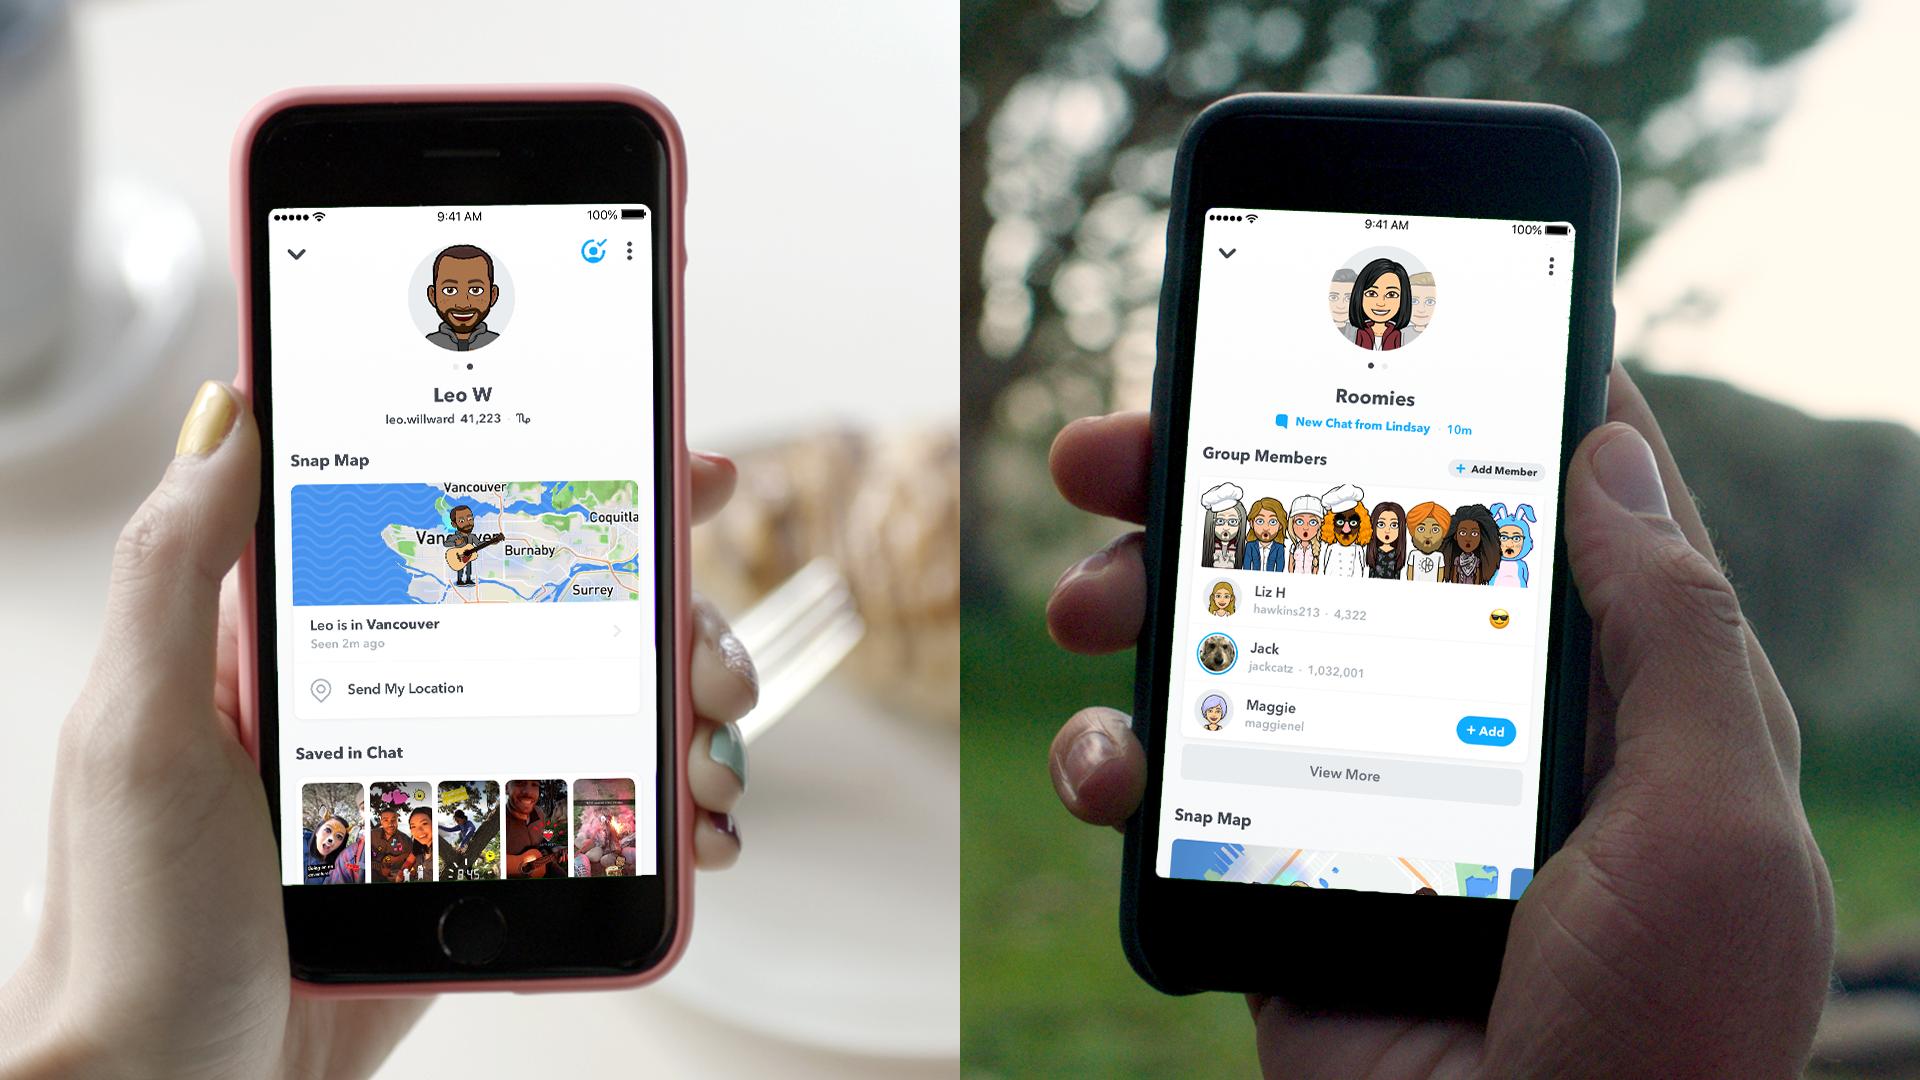 Snapchat Friendship Profiles